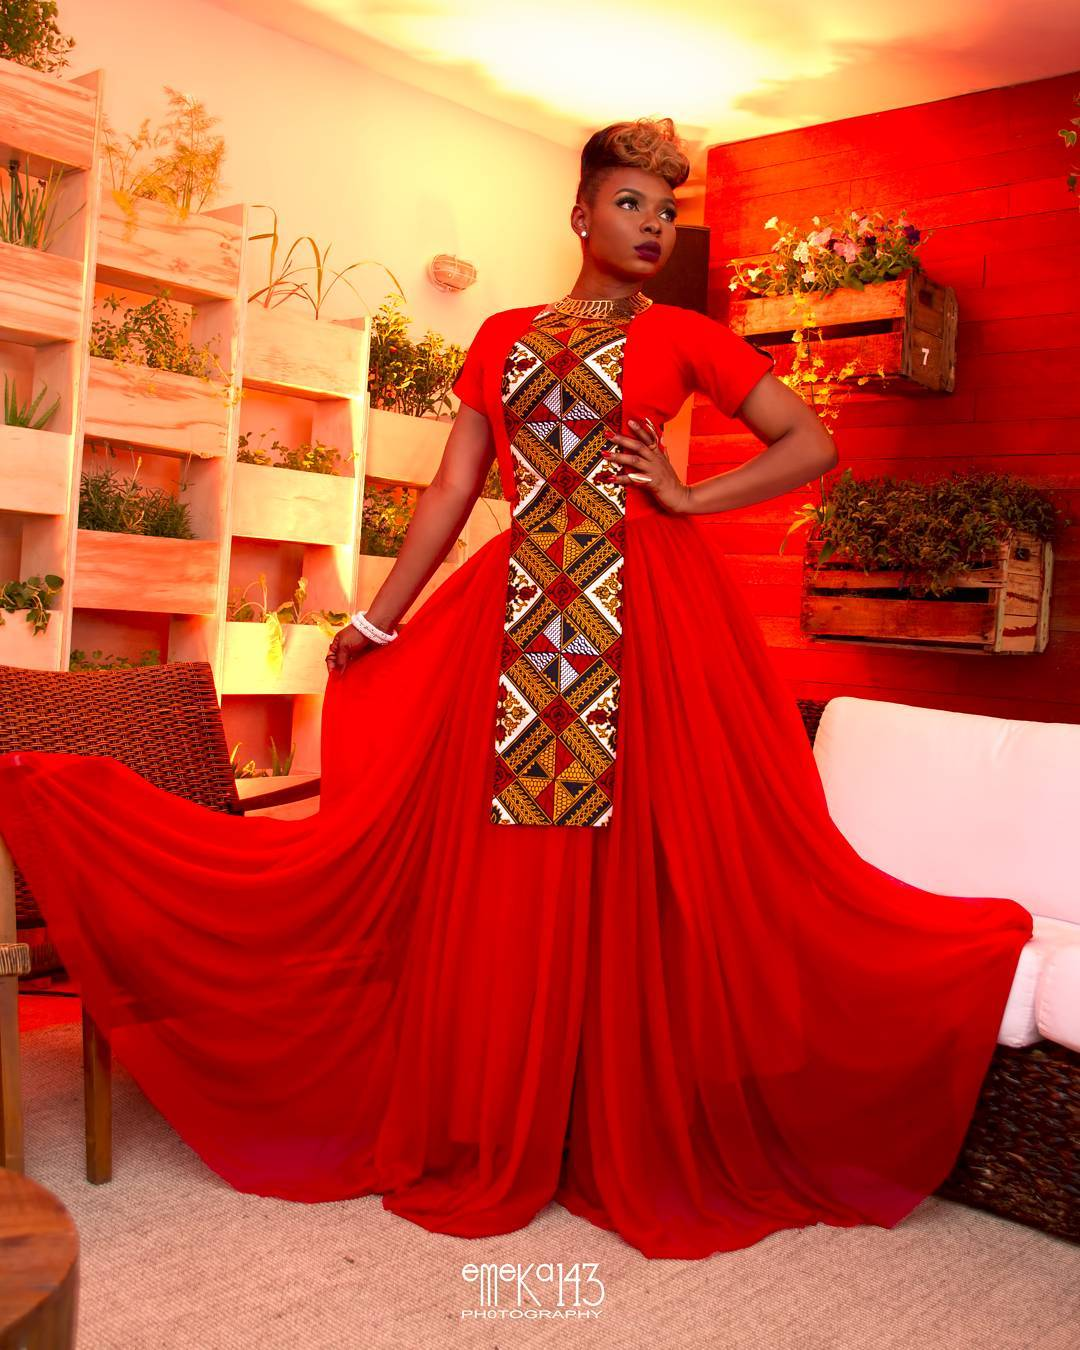 ankara-photo-of-the-day-yemi-alades-red-ankara-print-gown-for-shells-make-the-future-campaign-in-rio-de-janeiro-brazil